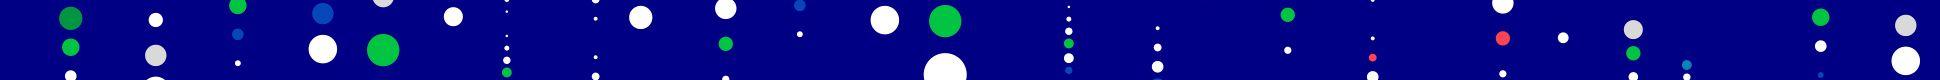 ITEA 4 page header cobalt dots